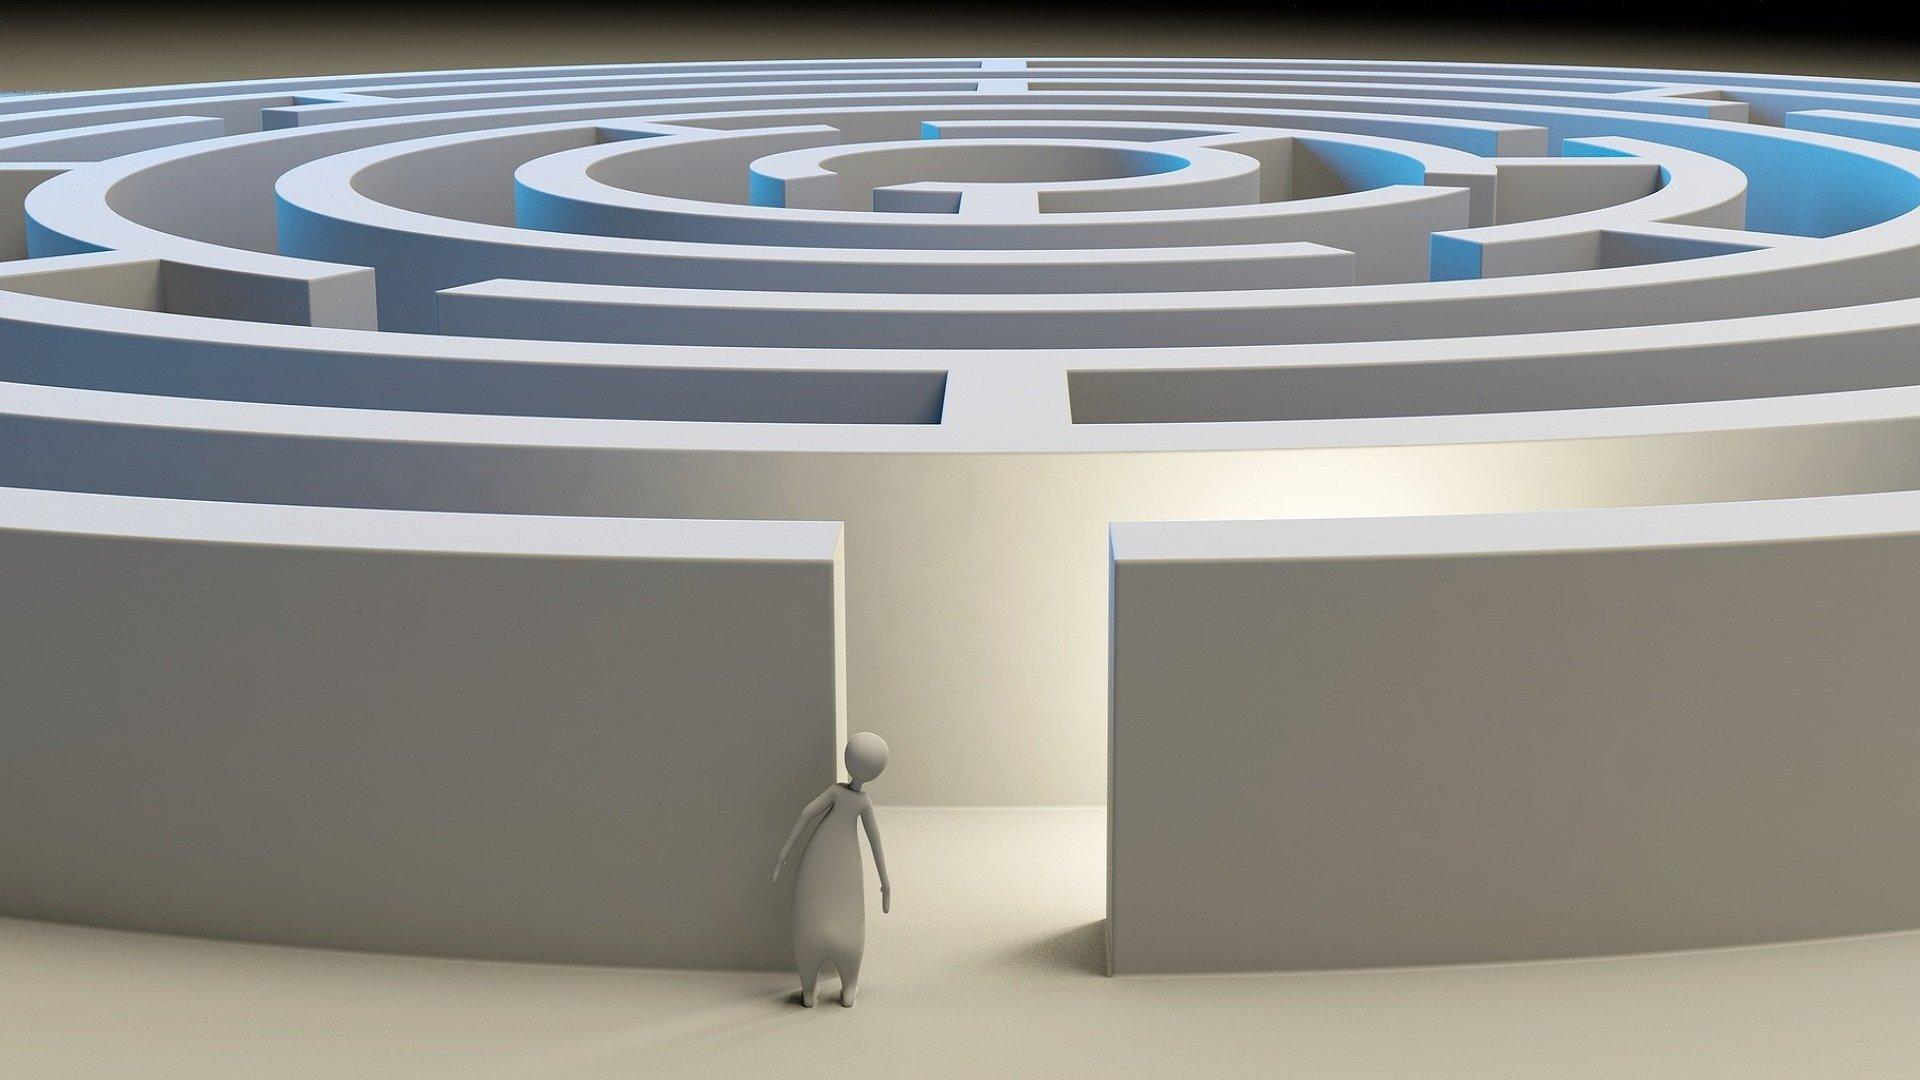 Labyrinth Wallpaper Pic